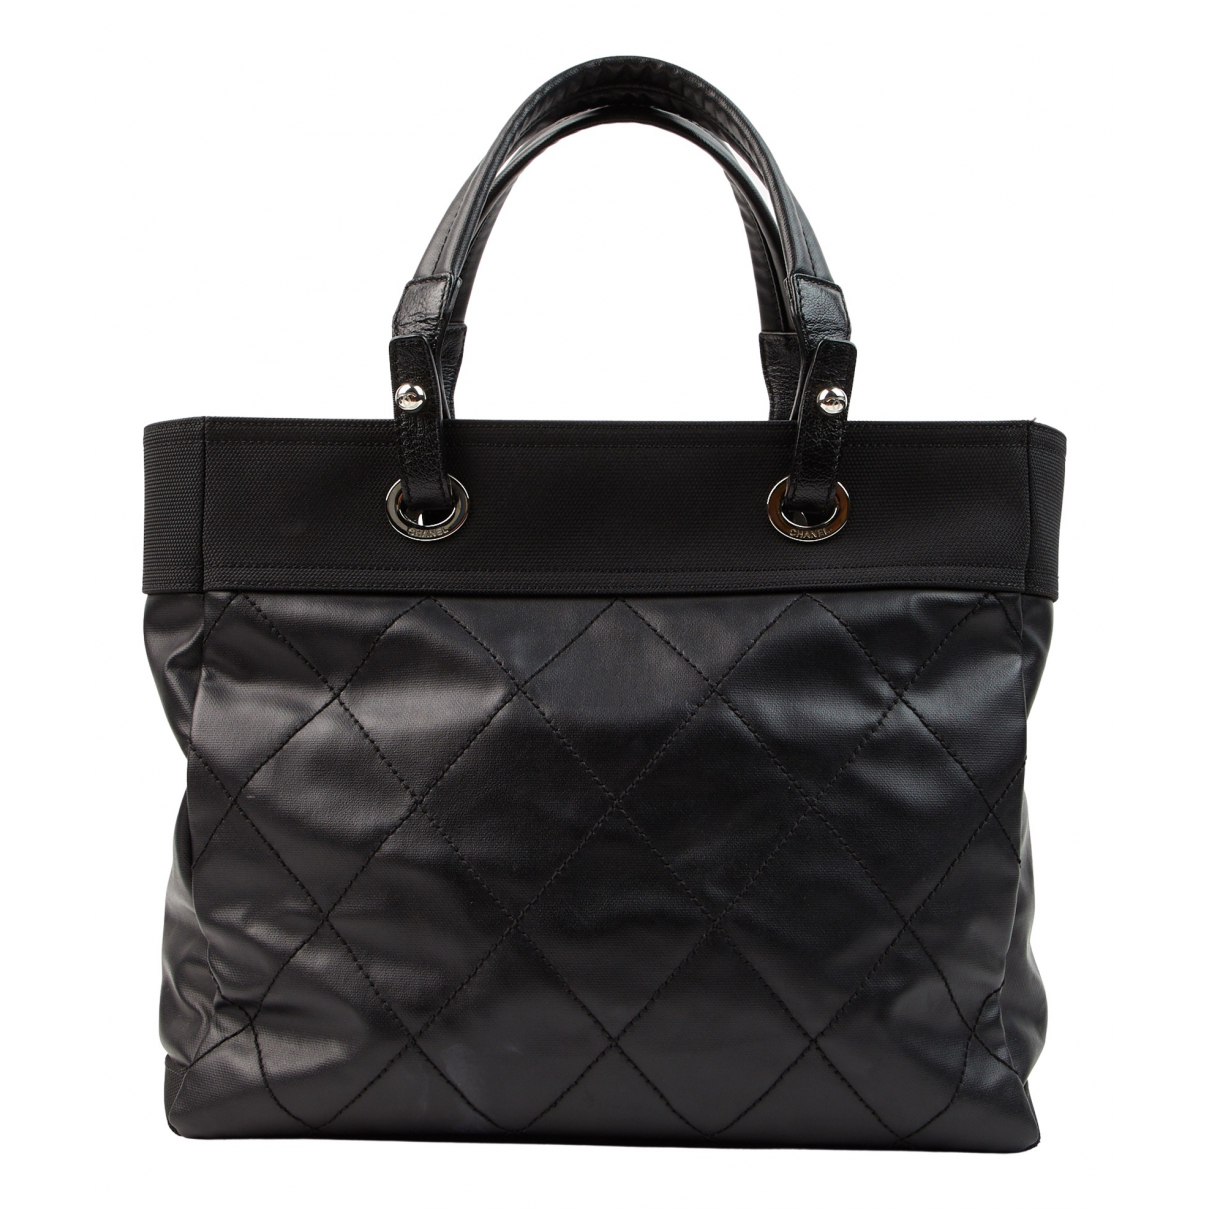 Chanel \N Black Cloth handbag for Women \N